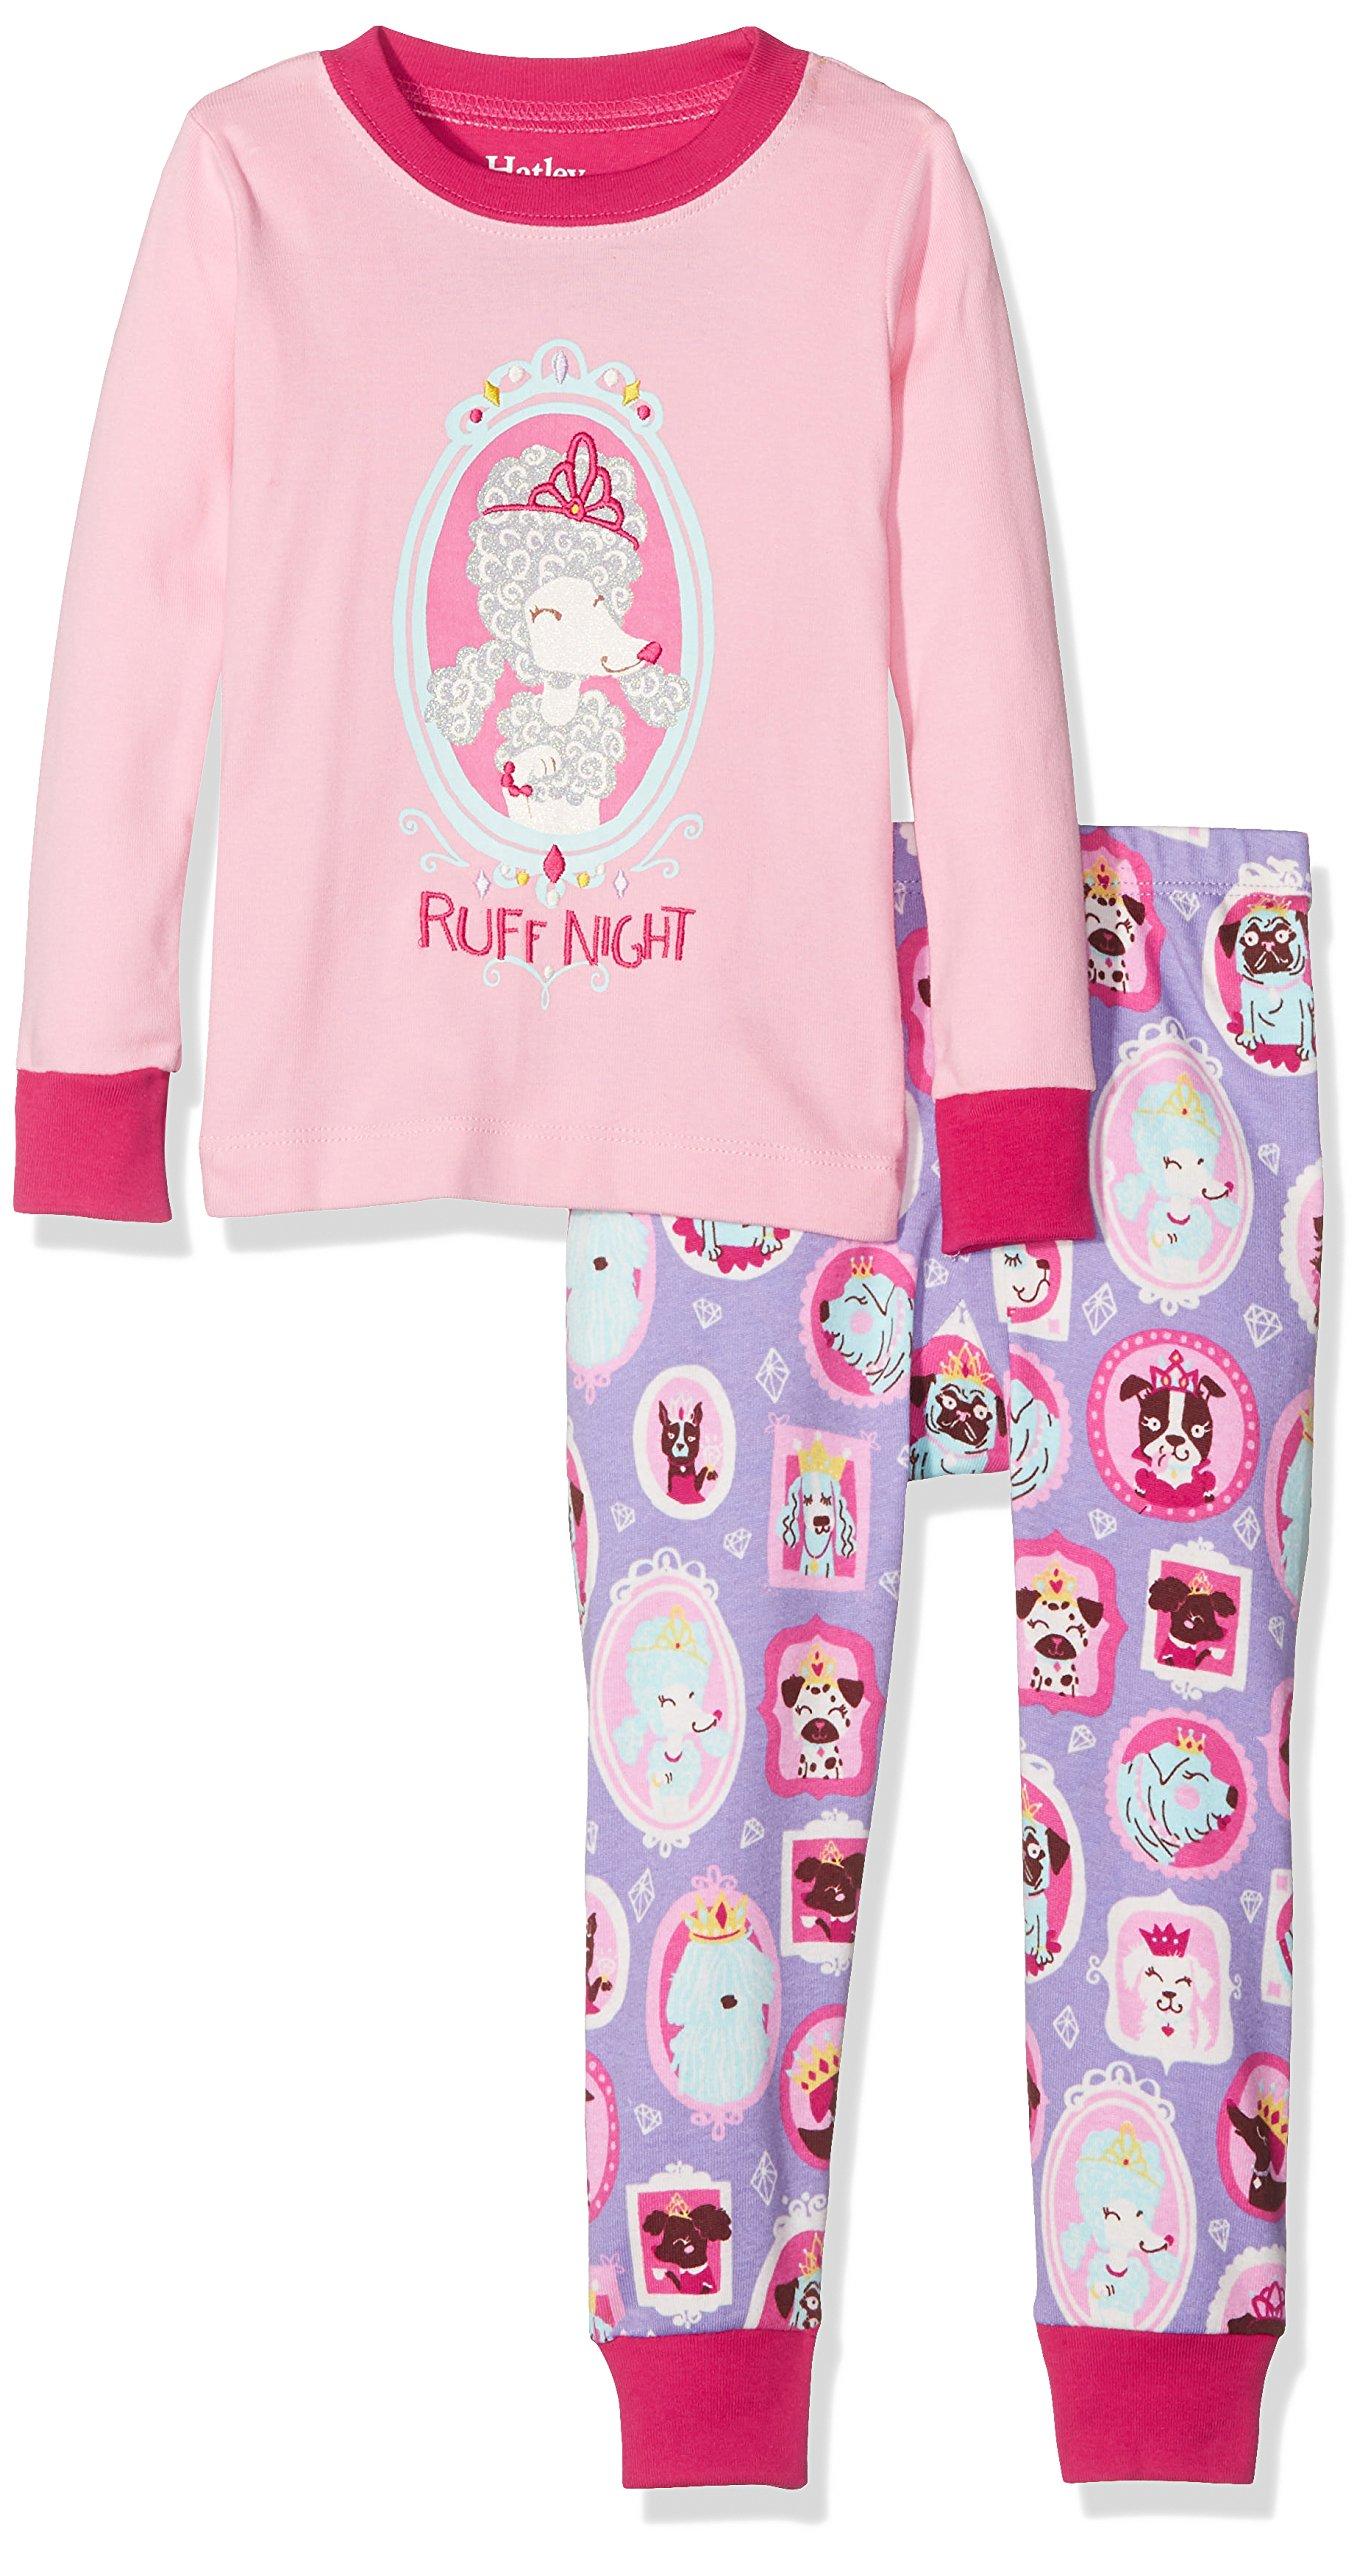 Hatley Kids Baby Girl's Princess Pups Ruff Night PJ Set (Toddler/Little Kids/Big Kids) Pink 5 by Hatley (Image #1)